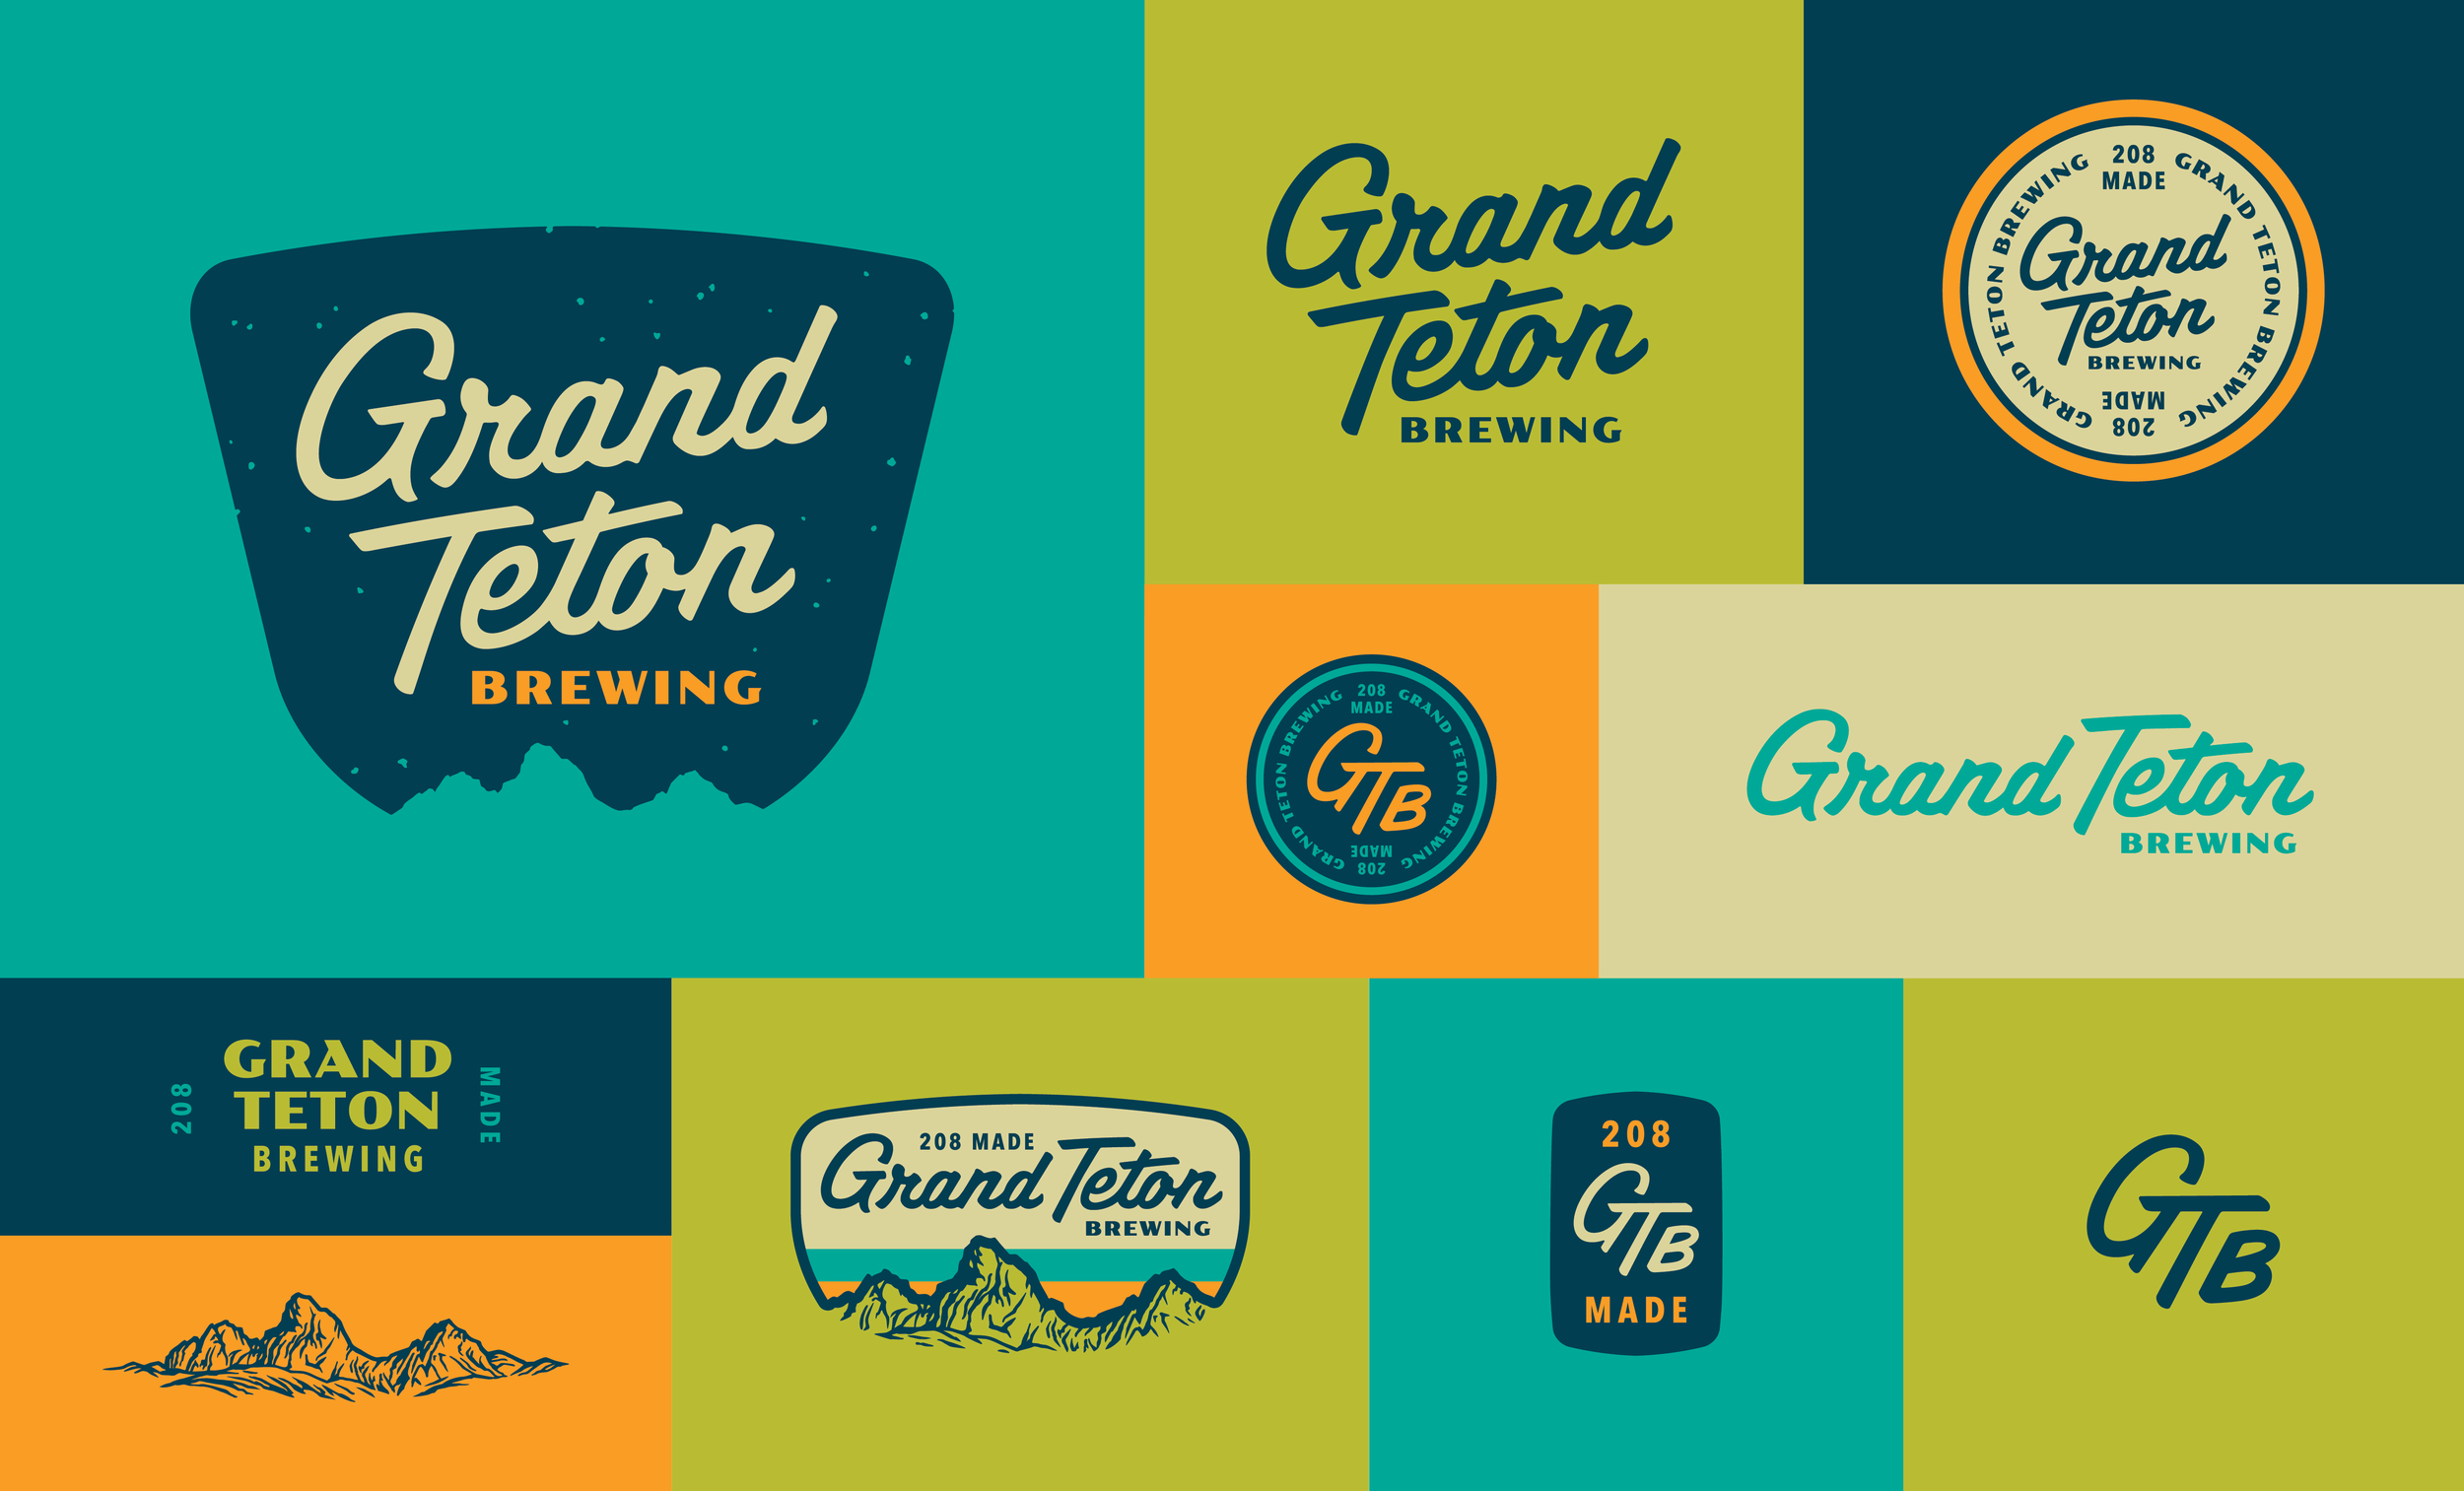 Blindtiger Design - Grand Teton Brewing 3.png